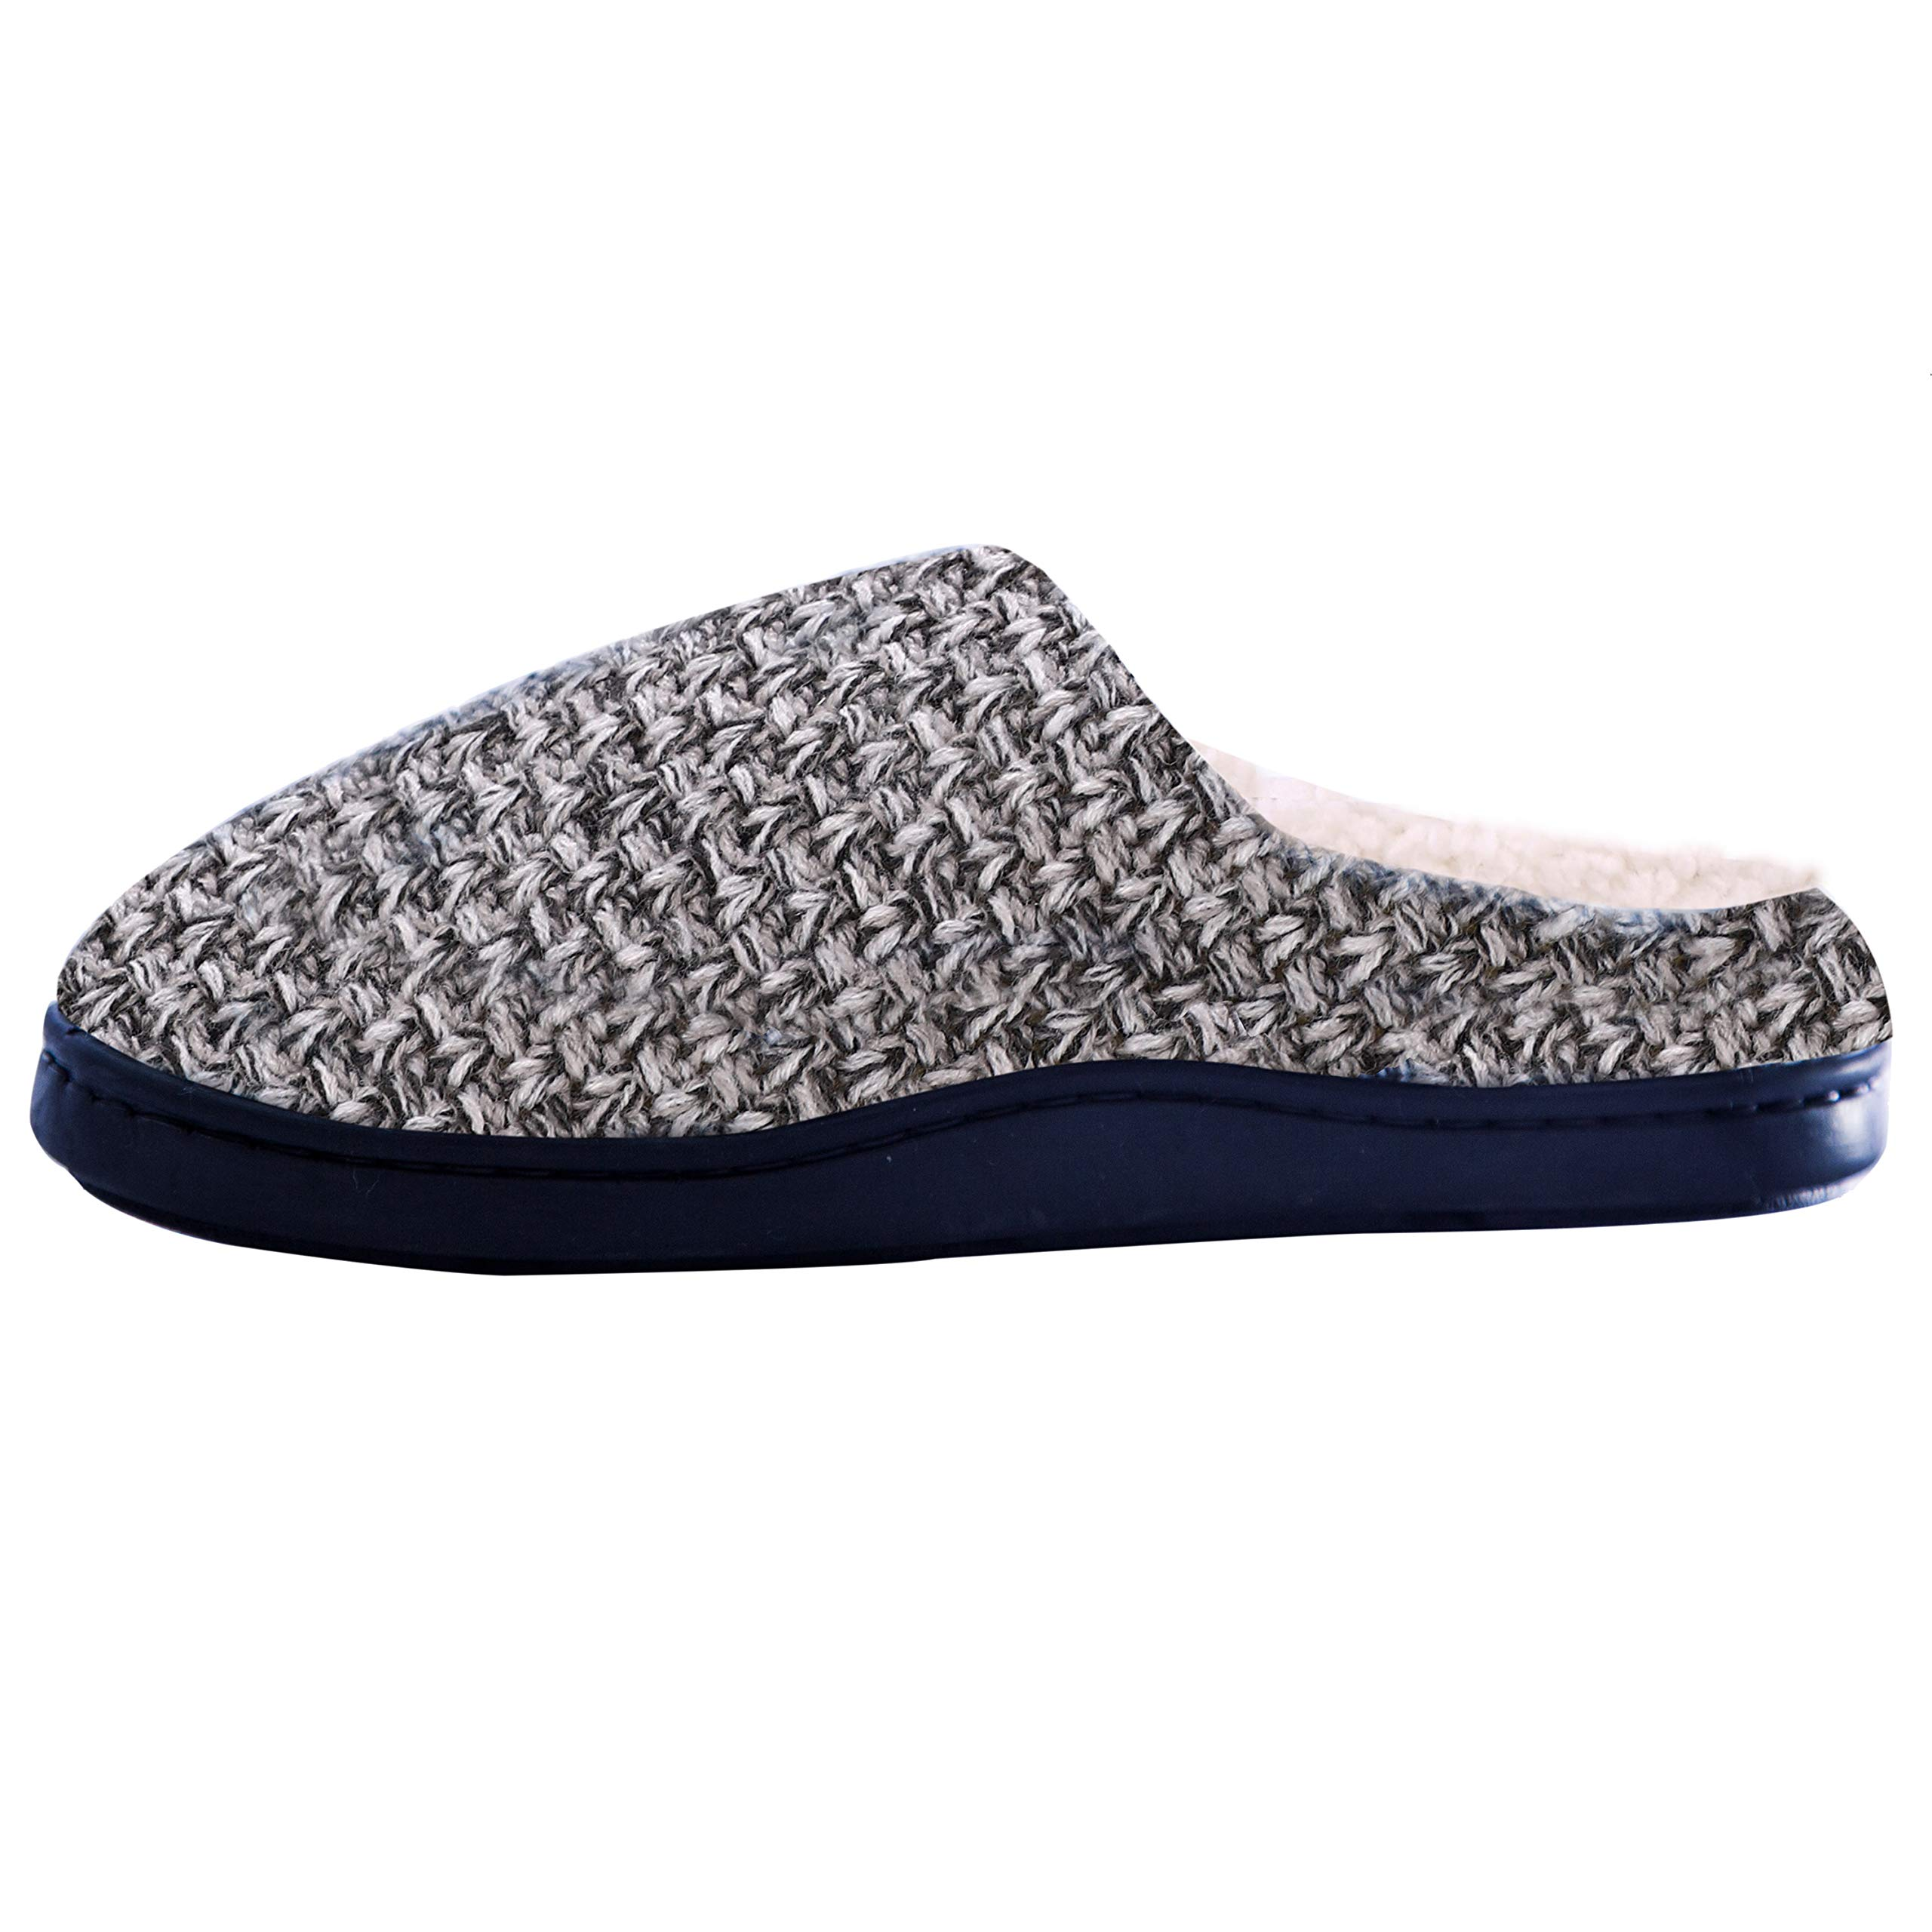 DRSLPAR House Memory Foam Slippers Comfort Plush Lining Slip-on Knit Indoor Outdoor Shoes for Men Women(Grey-Beige X-Large) by DRSLPAR (Image #6)